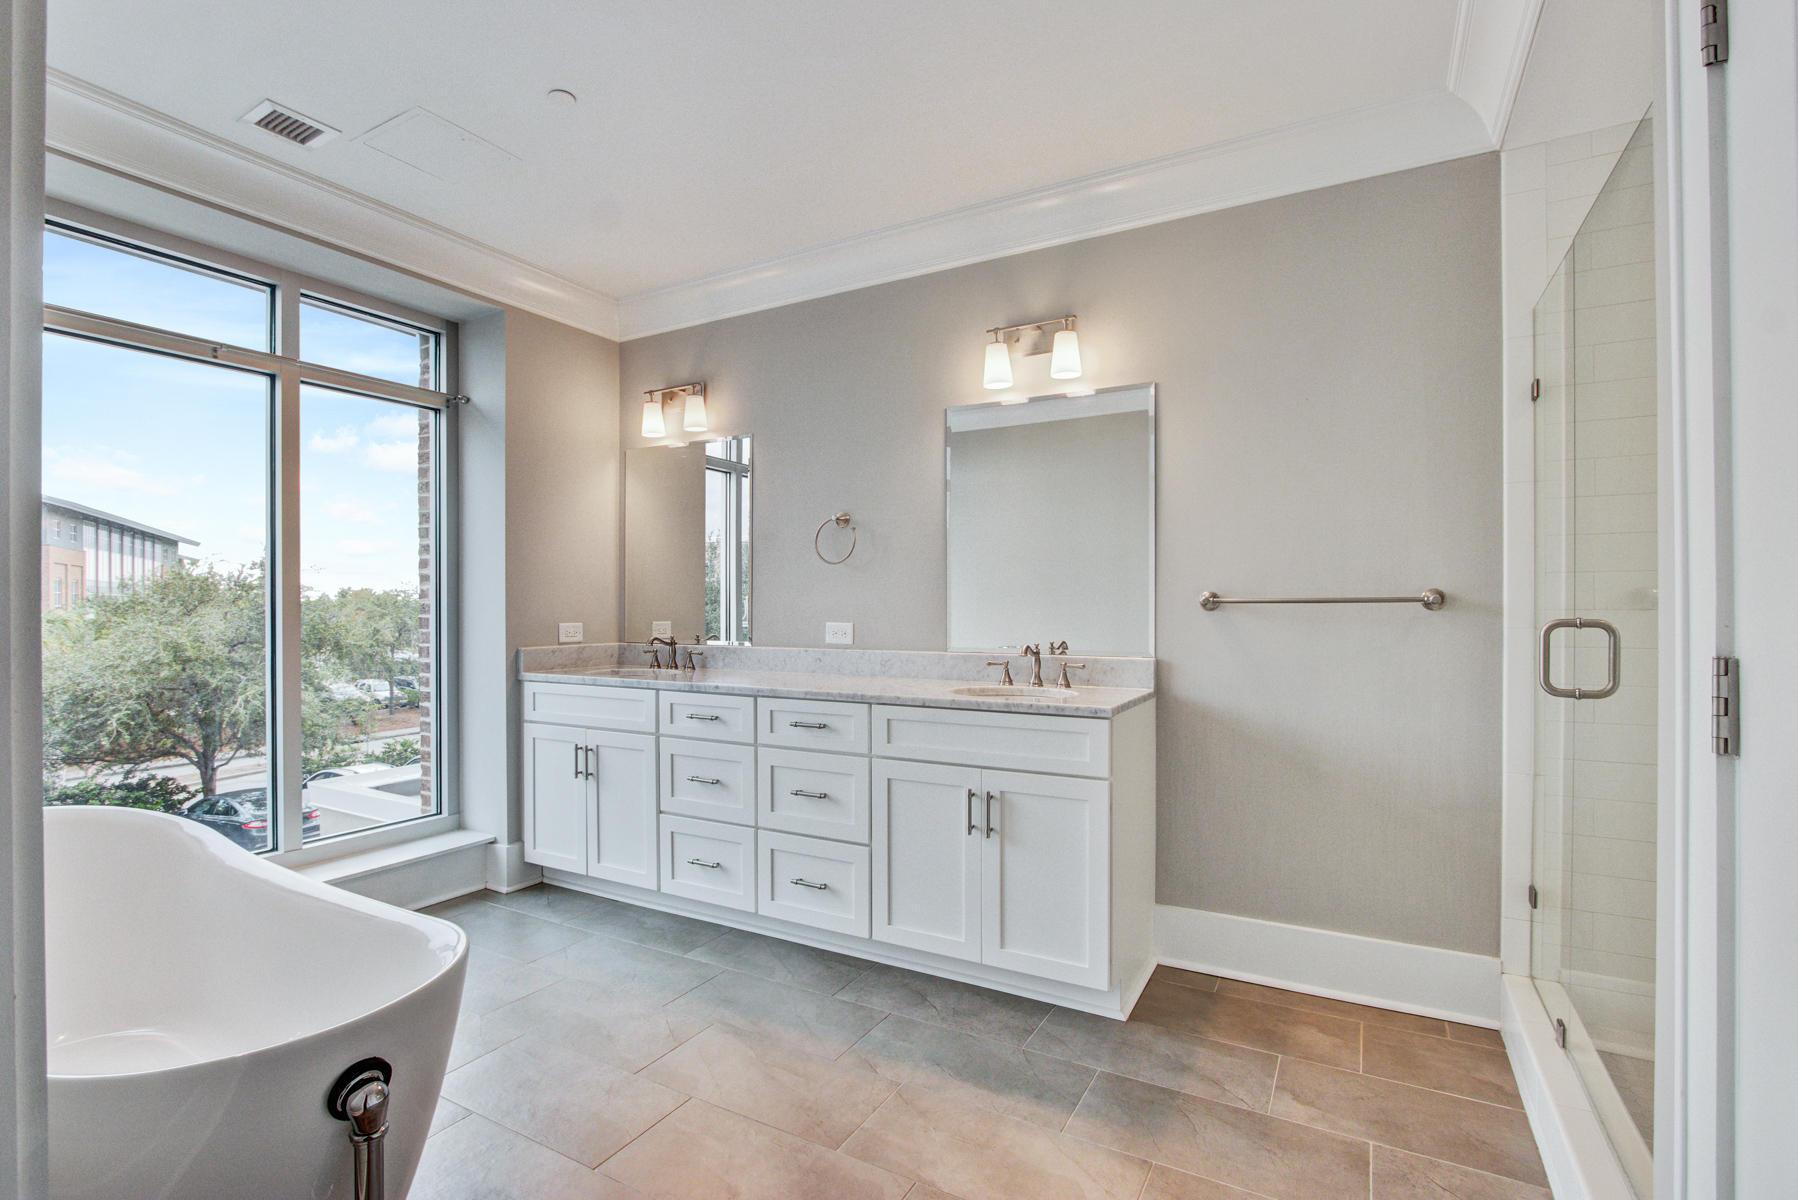 Tides IV Condominiums Homes For Sale - 155 Wingo, Mount Pleasant, SC - 46